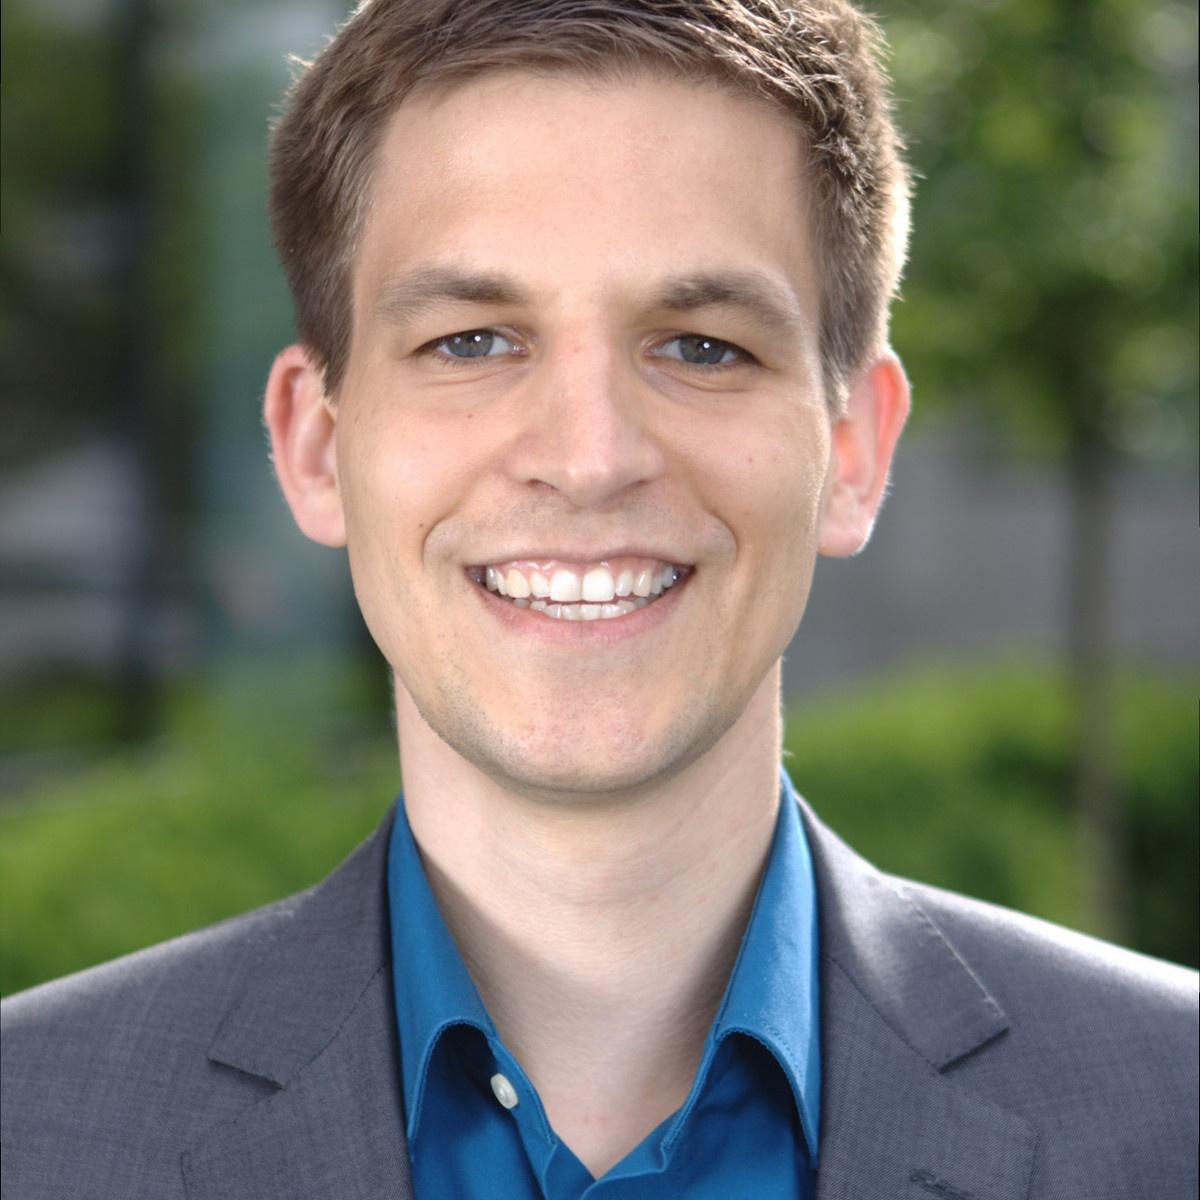 Konstantin Ristl